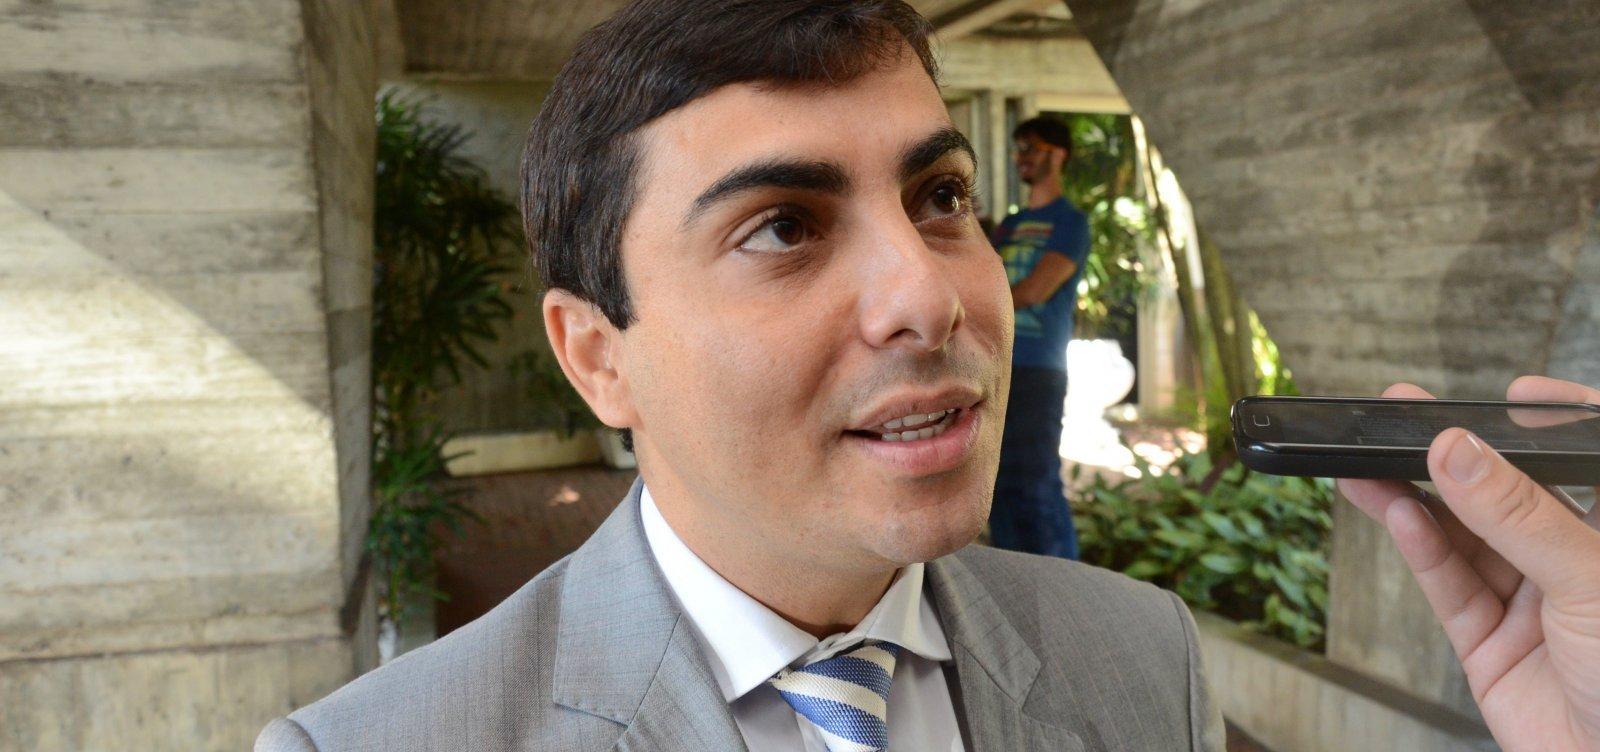 Caso Marcell Moraes: primo diz que amante teve cabelo cortado e ...